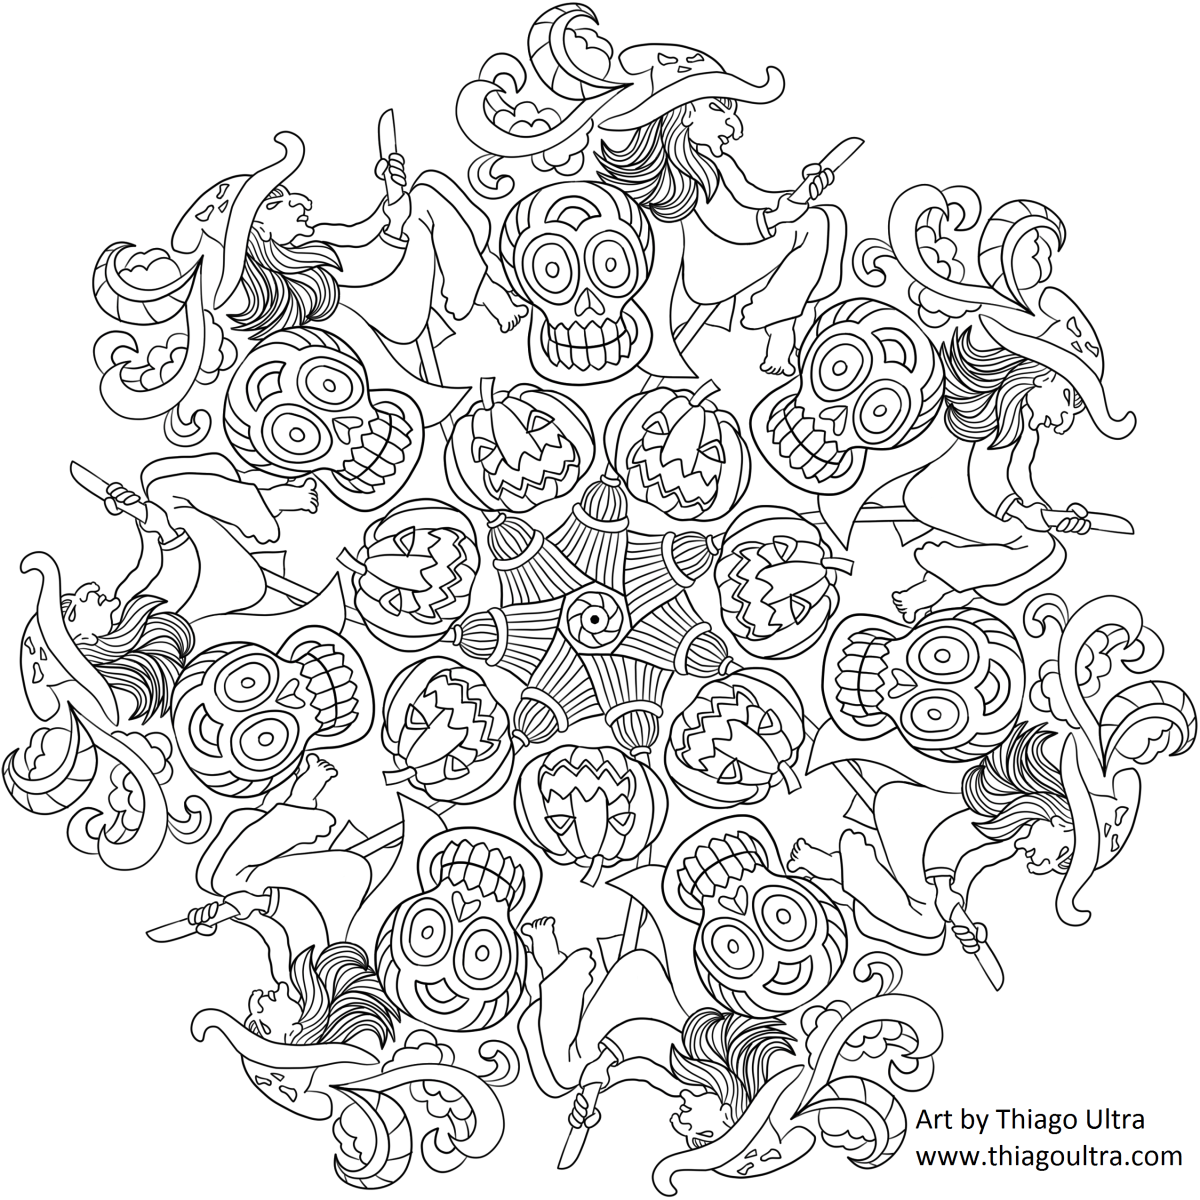 Free Coloring Page Halloween Mandala Mandala Do Halloween Mandala Coloring Pages Coloring Pages Mandala Coloring